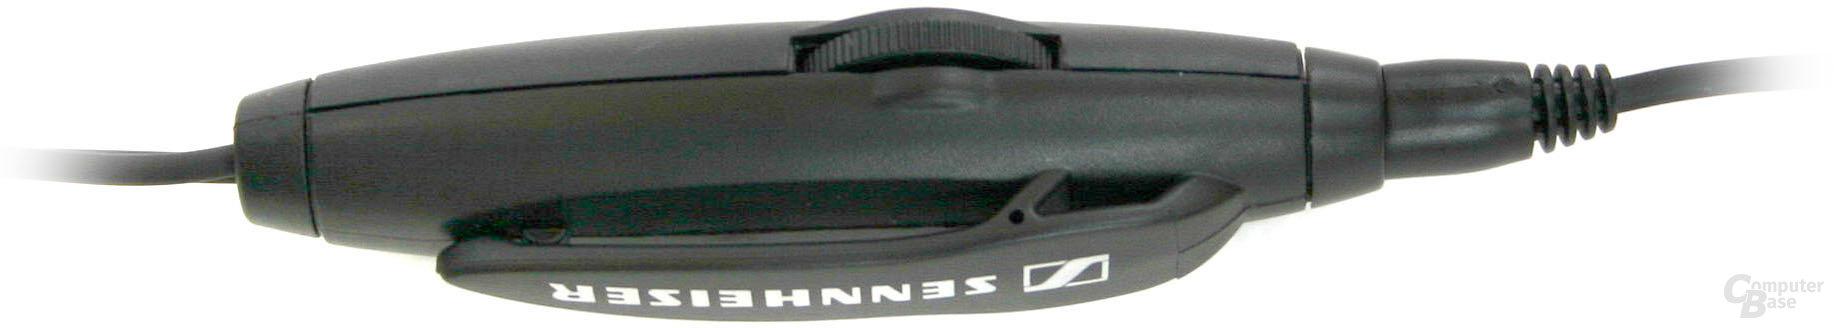 Sennheiser PC 130 Kabelschalter #2